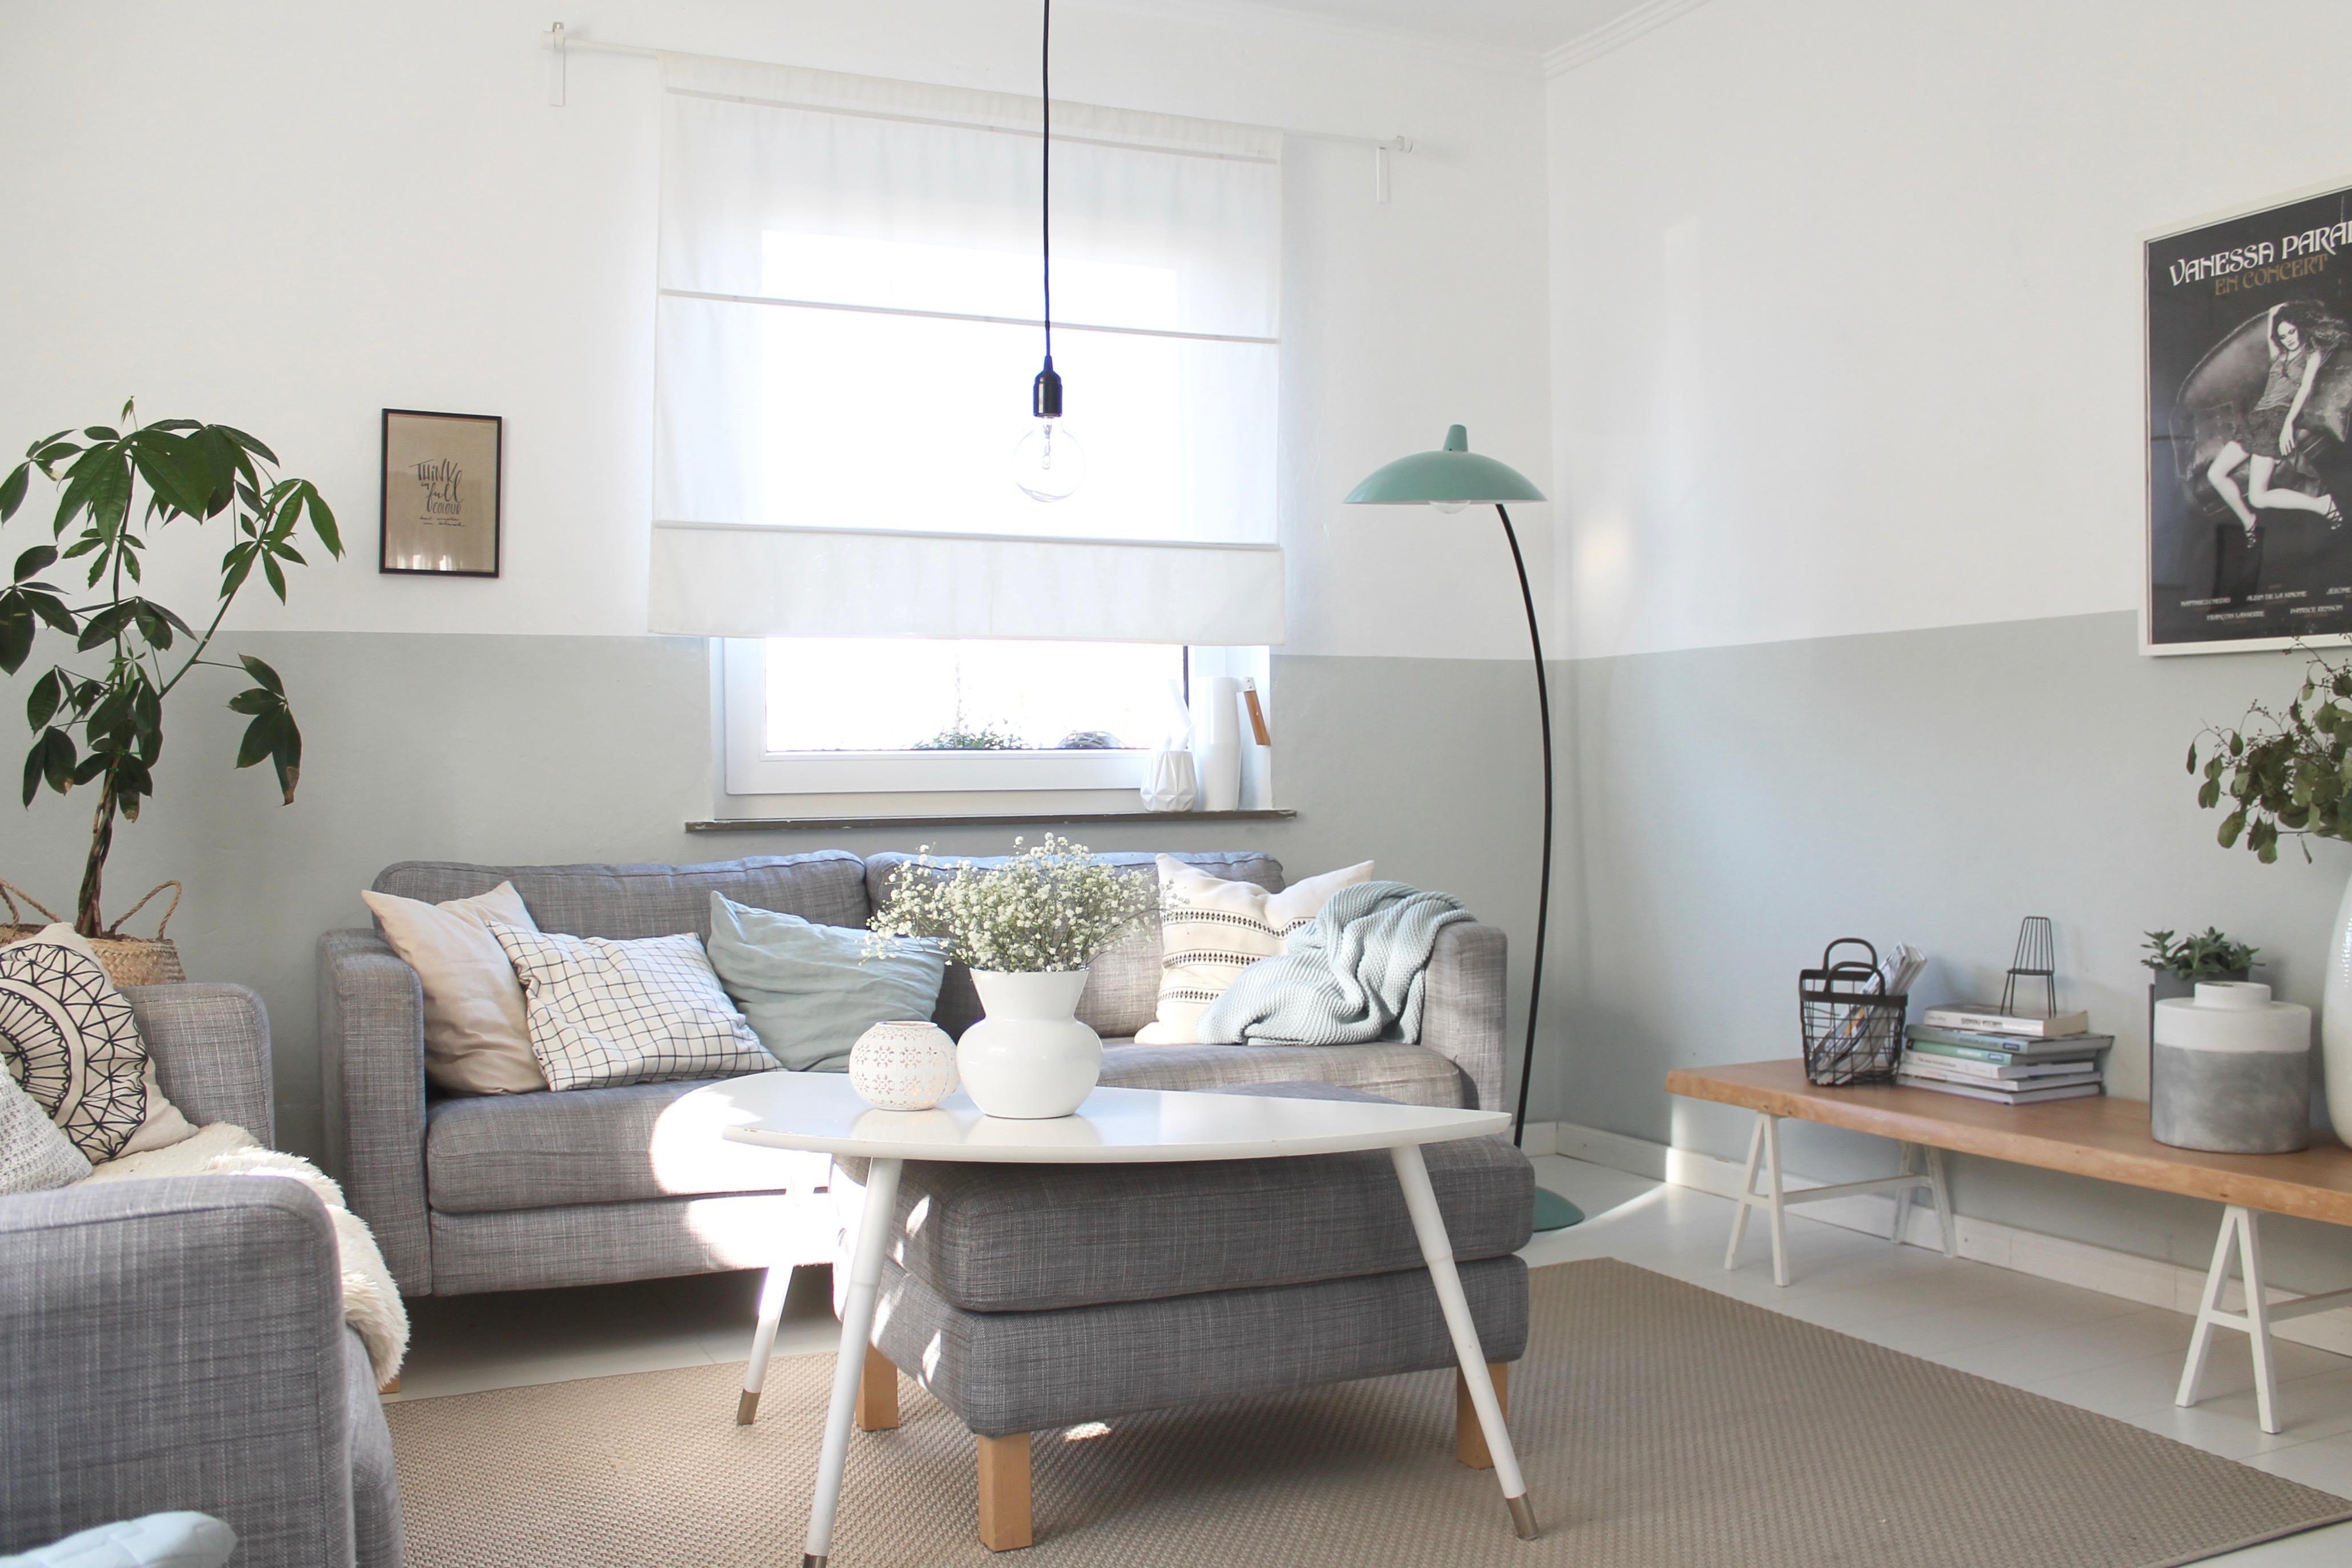 https://cdn.couchstyle.de/bilder/hauptbild/sonne-i...